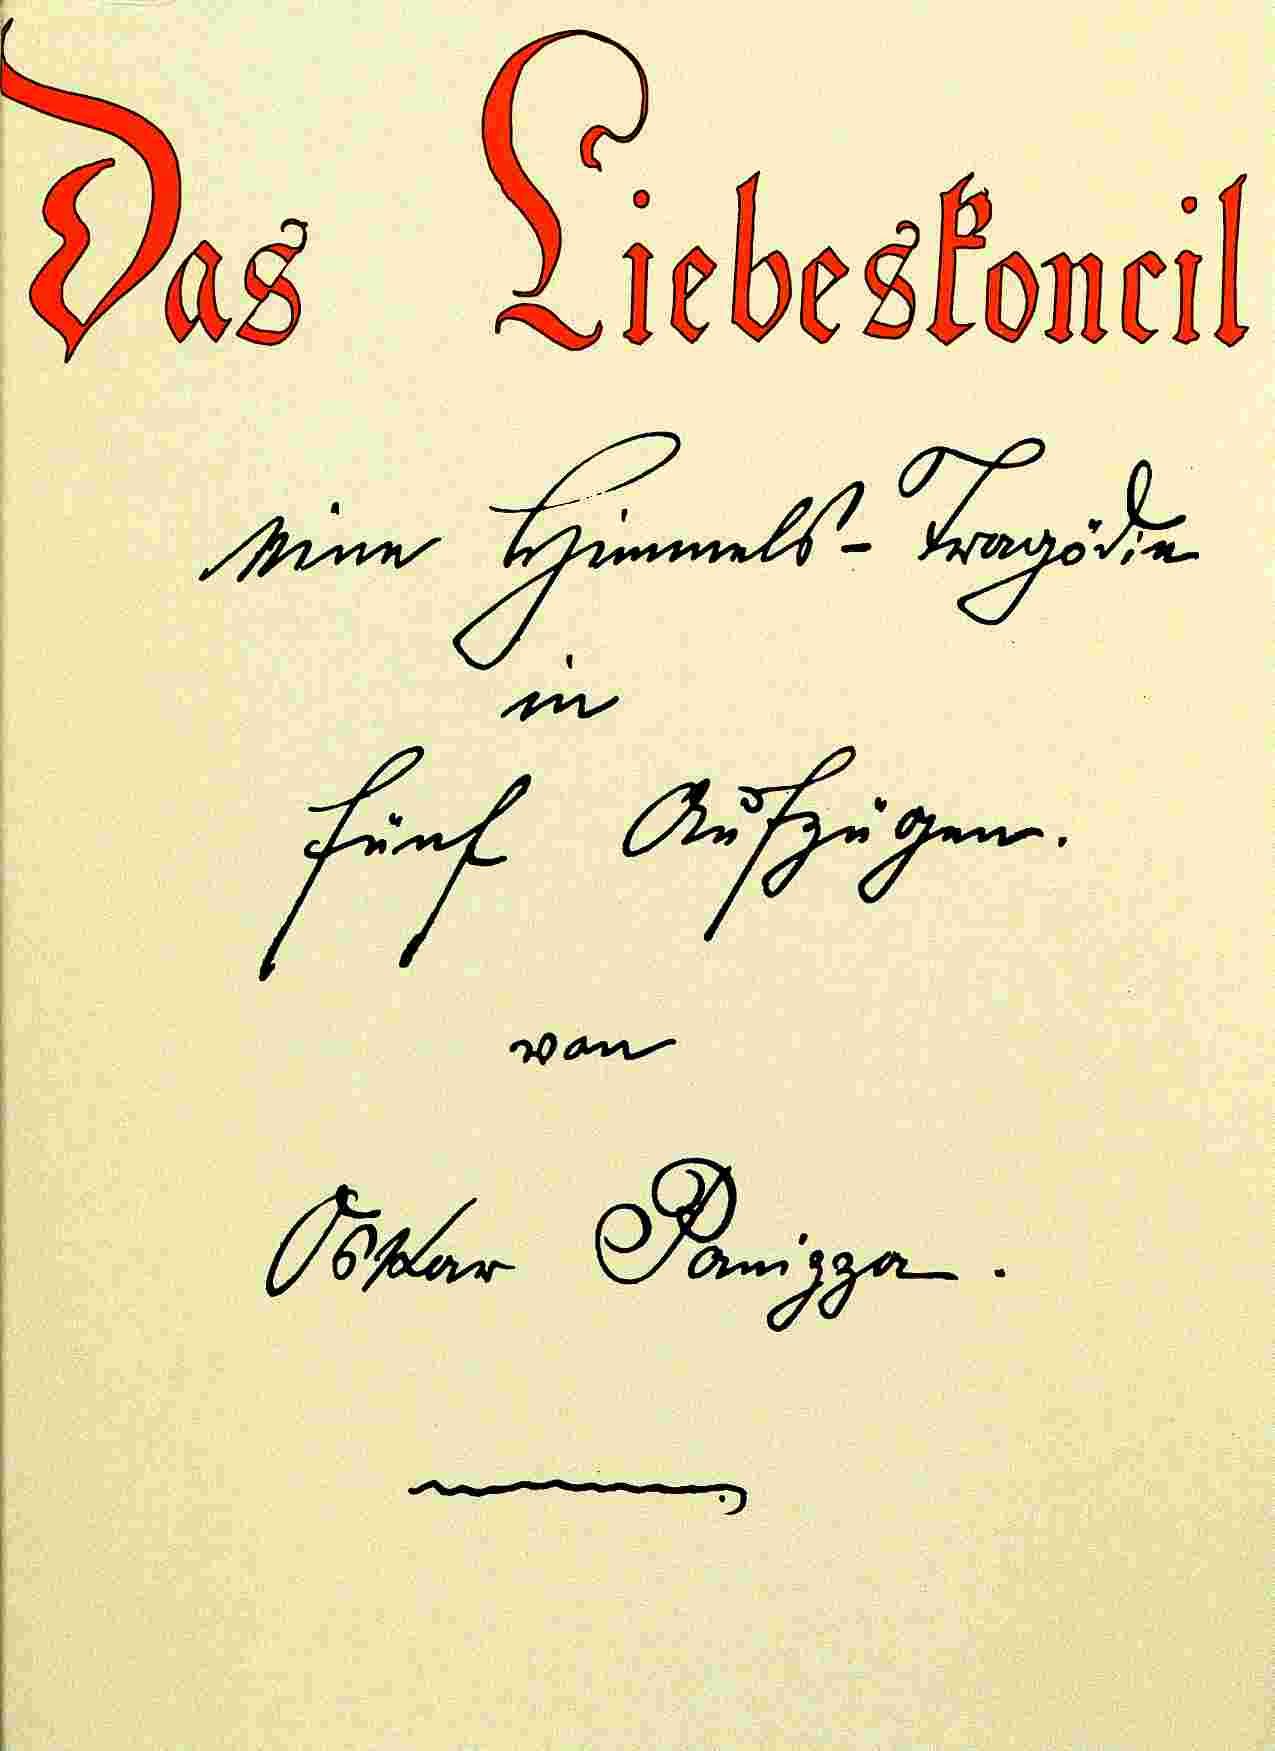 Liebeskoncil manuscript title page